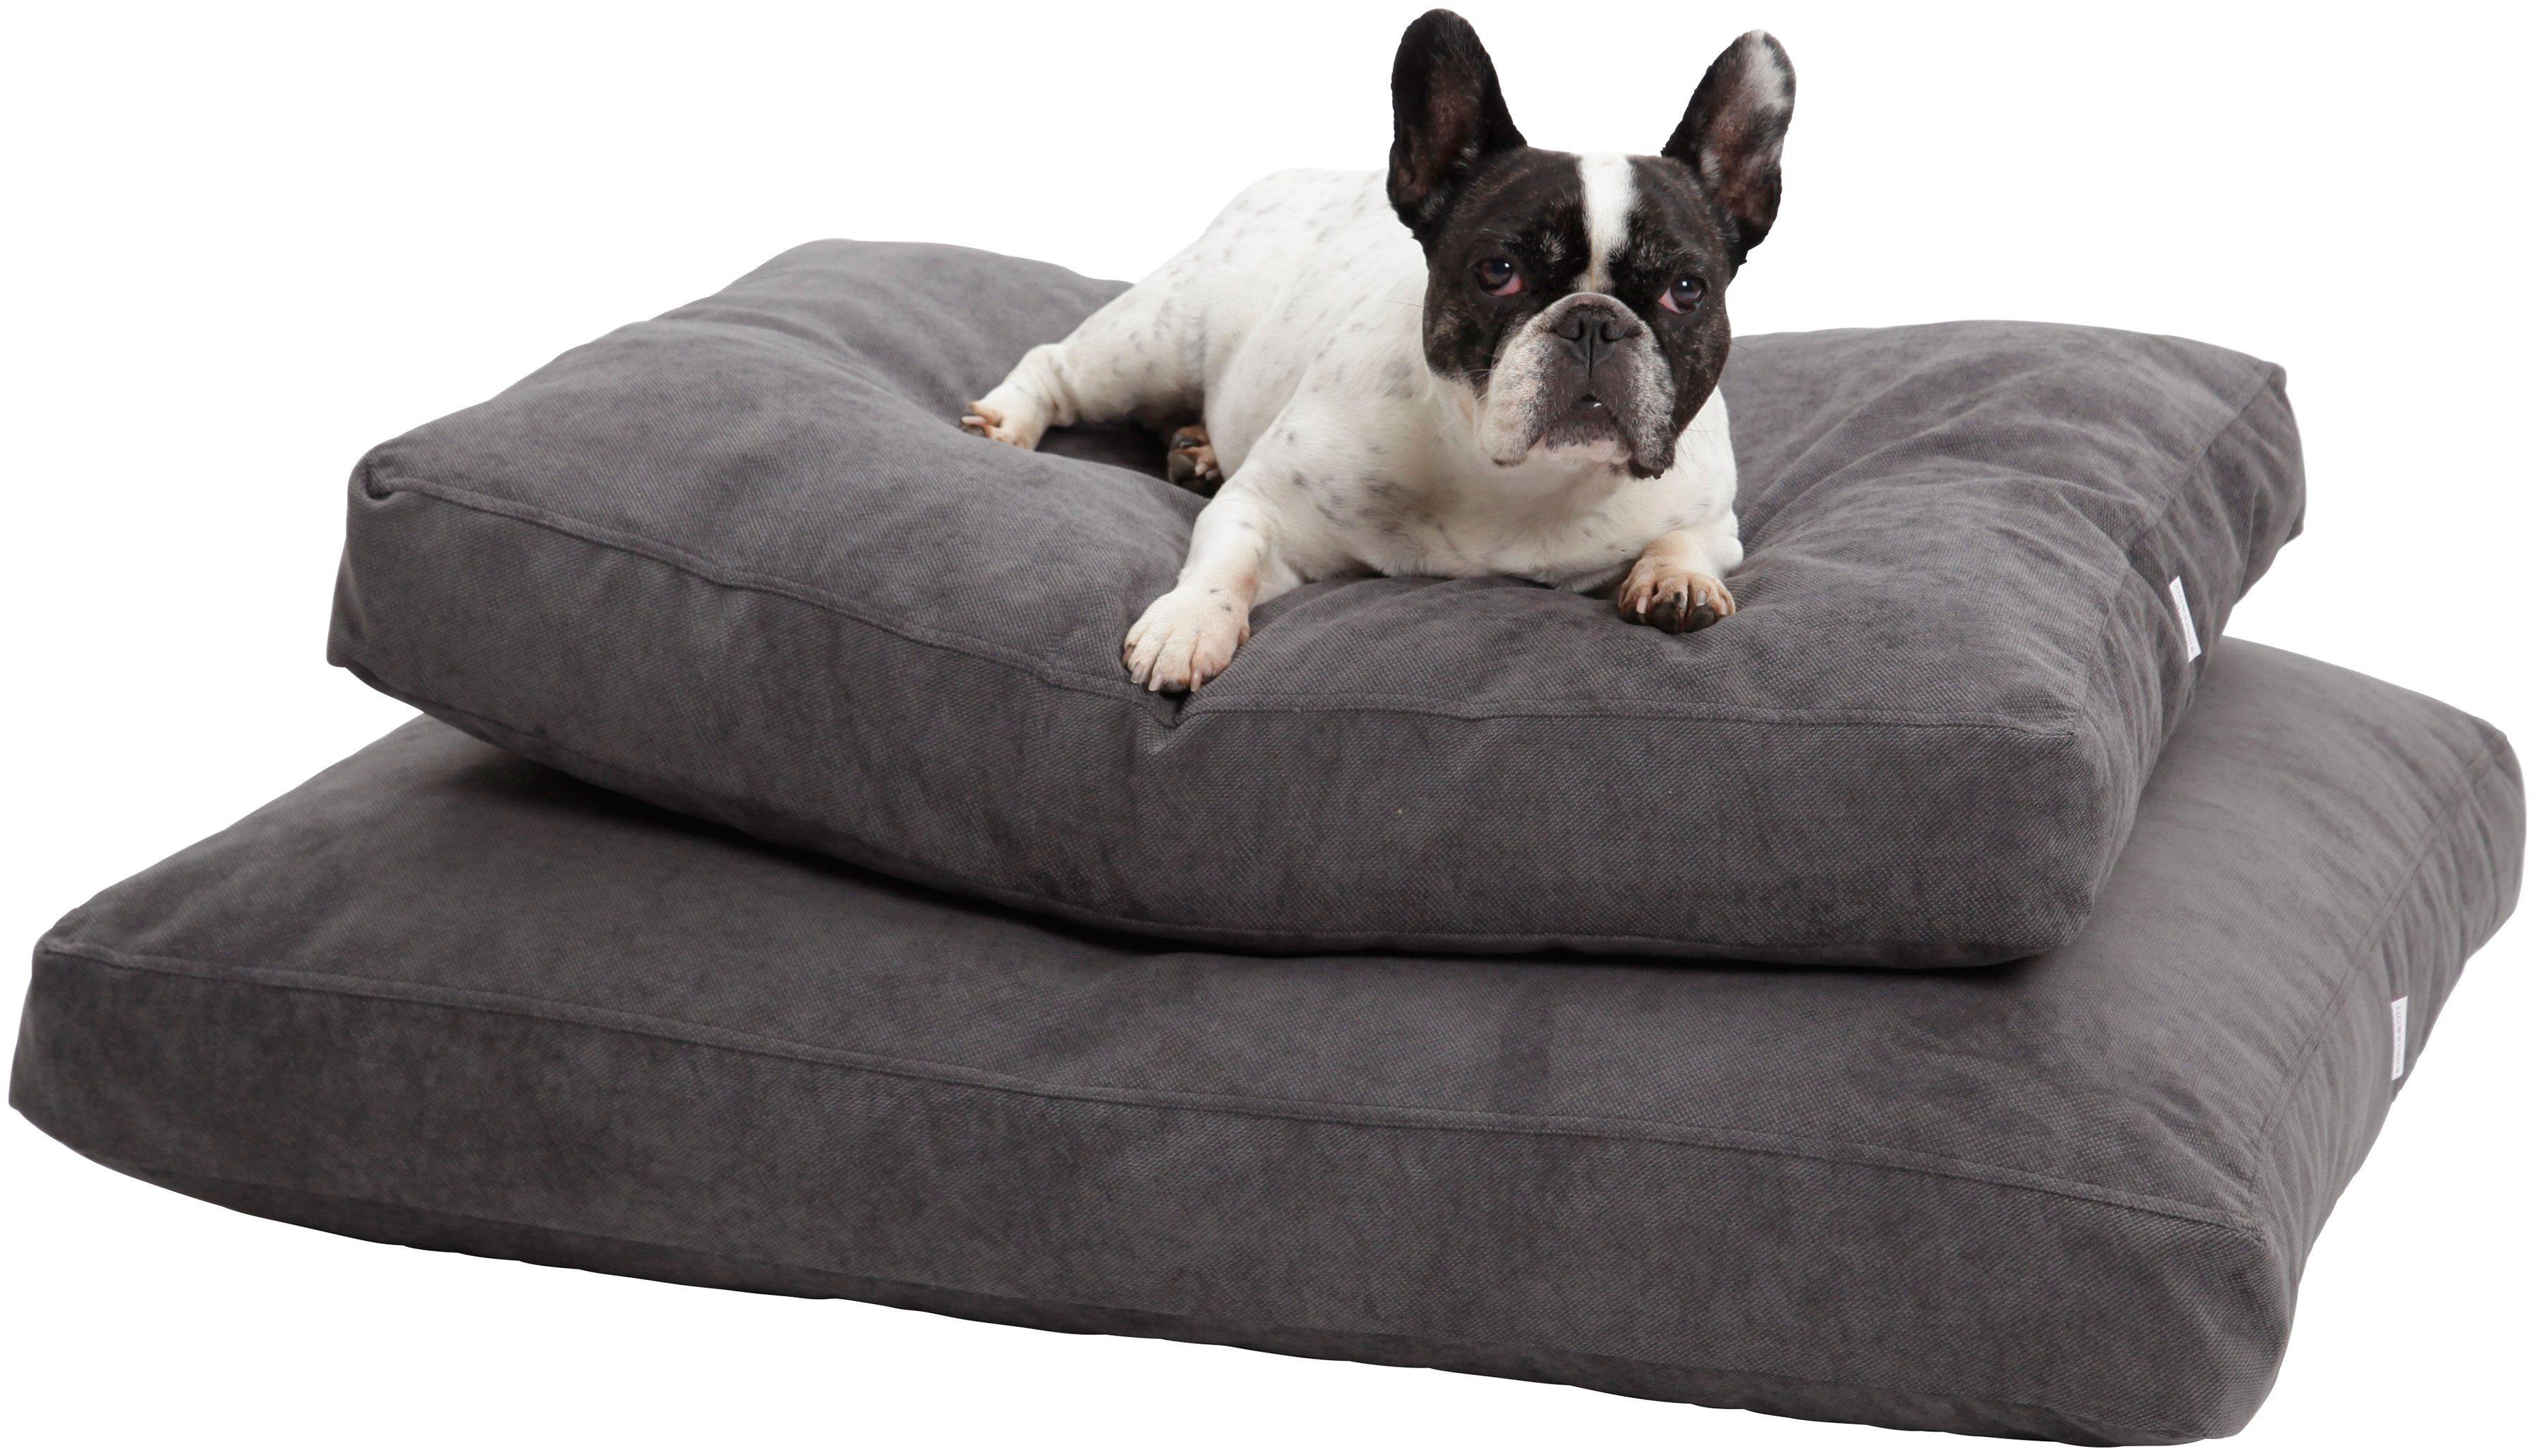 Hundekissen und Katzenkissen »Madison«, B/T/H: 80/60/10 cm, Anthrazit